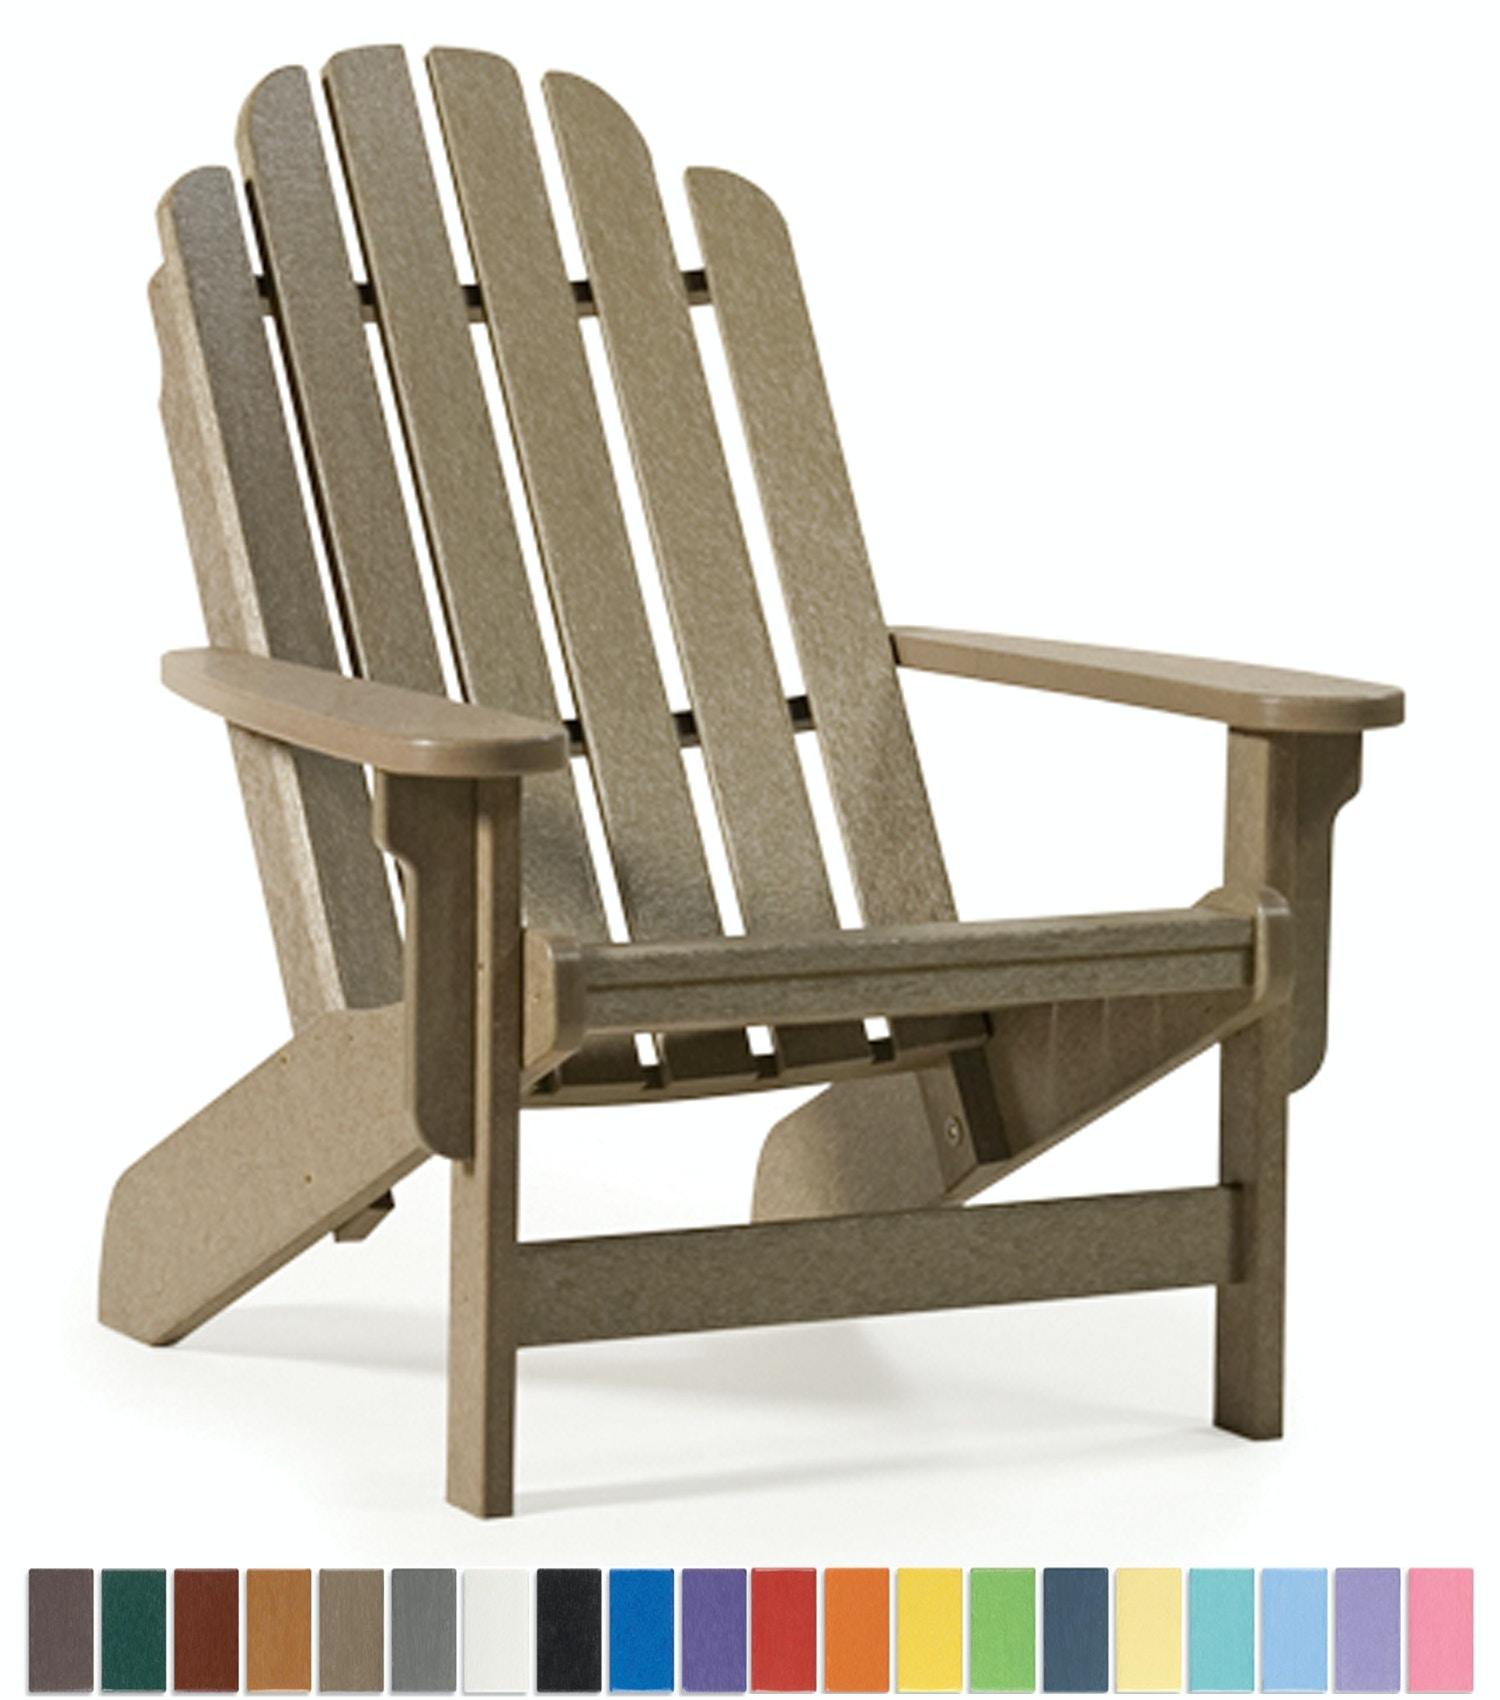 Breezesta Adirondack Chair AD 0100